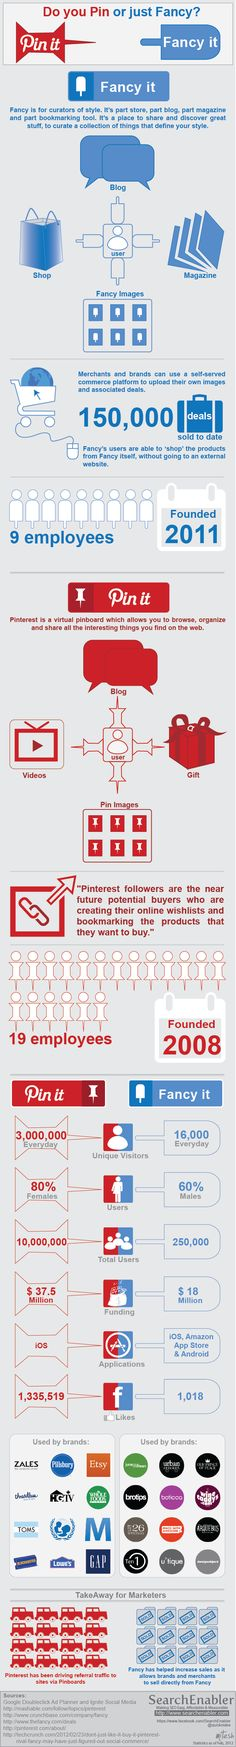 Pinterest vs the Fancy #infografia #infographic #socialmedia | TICs y Formación